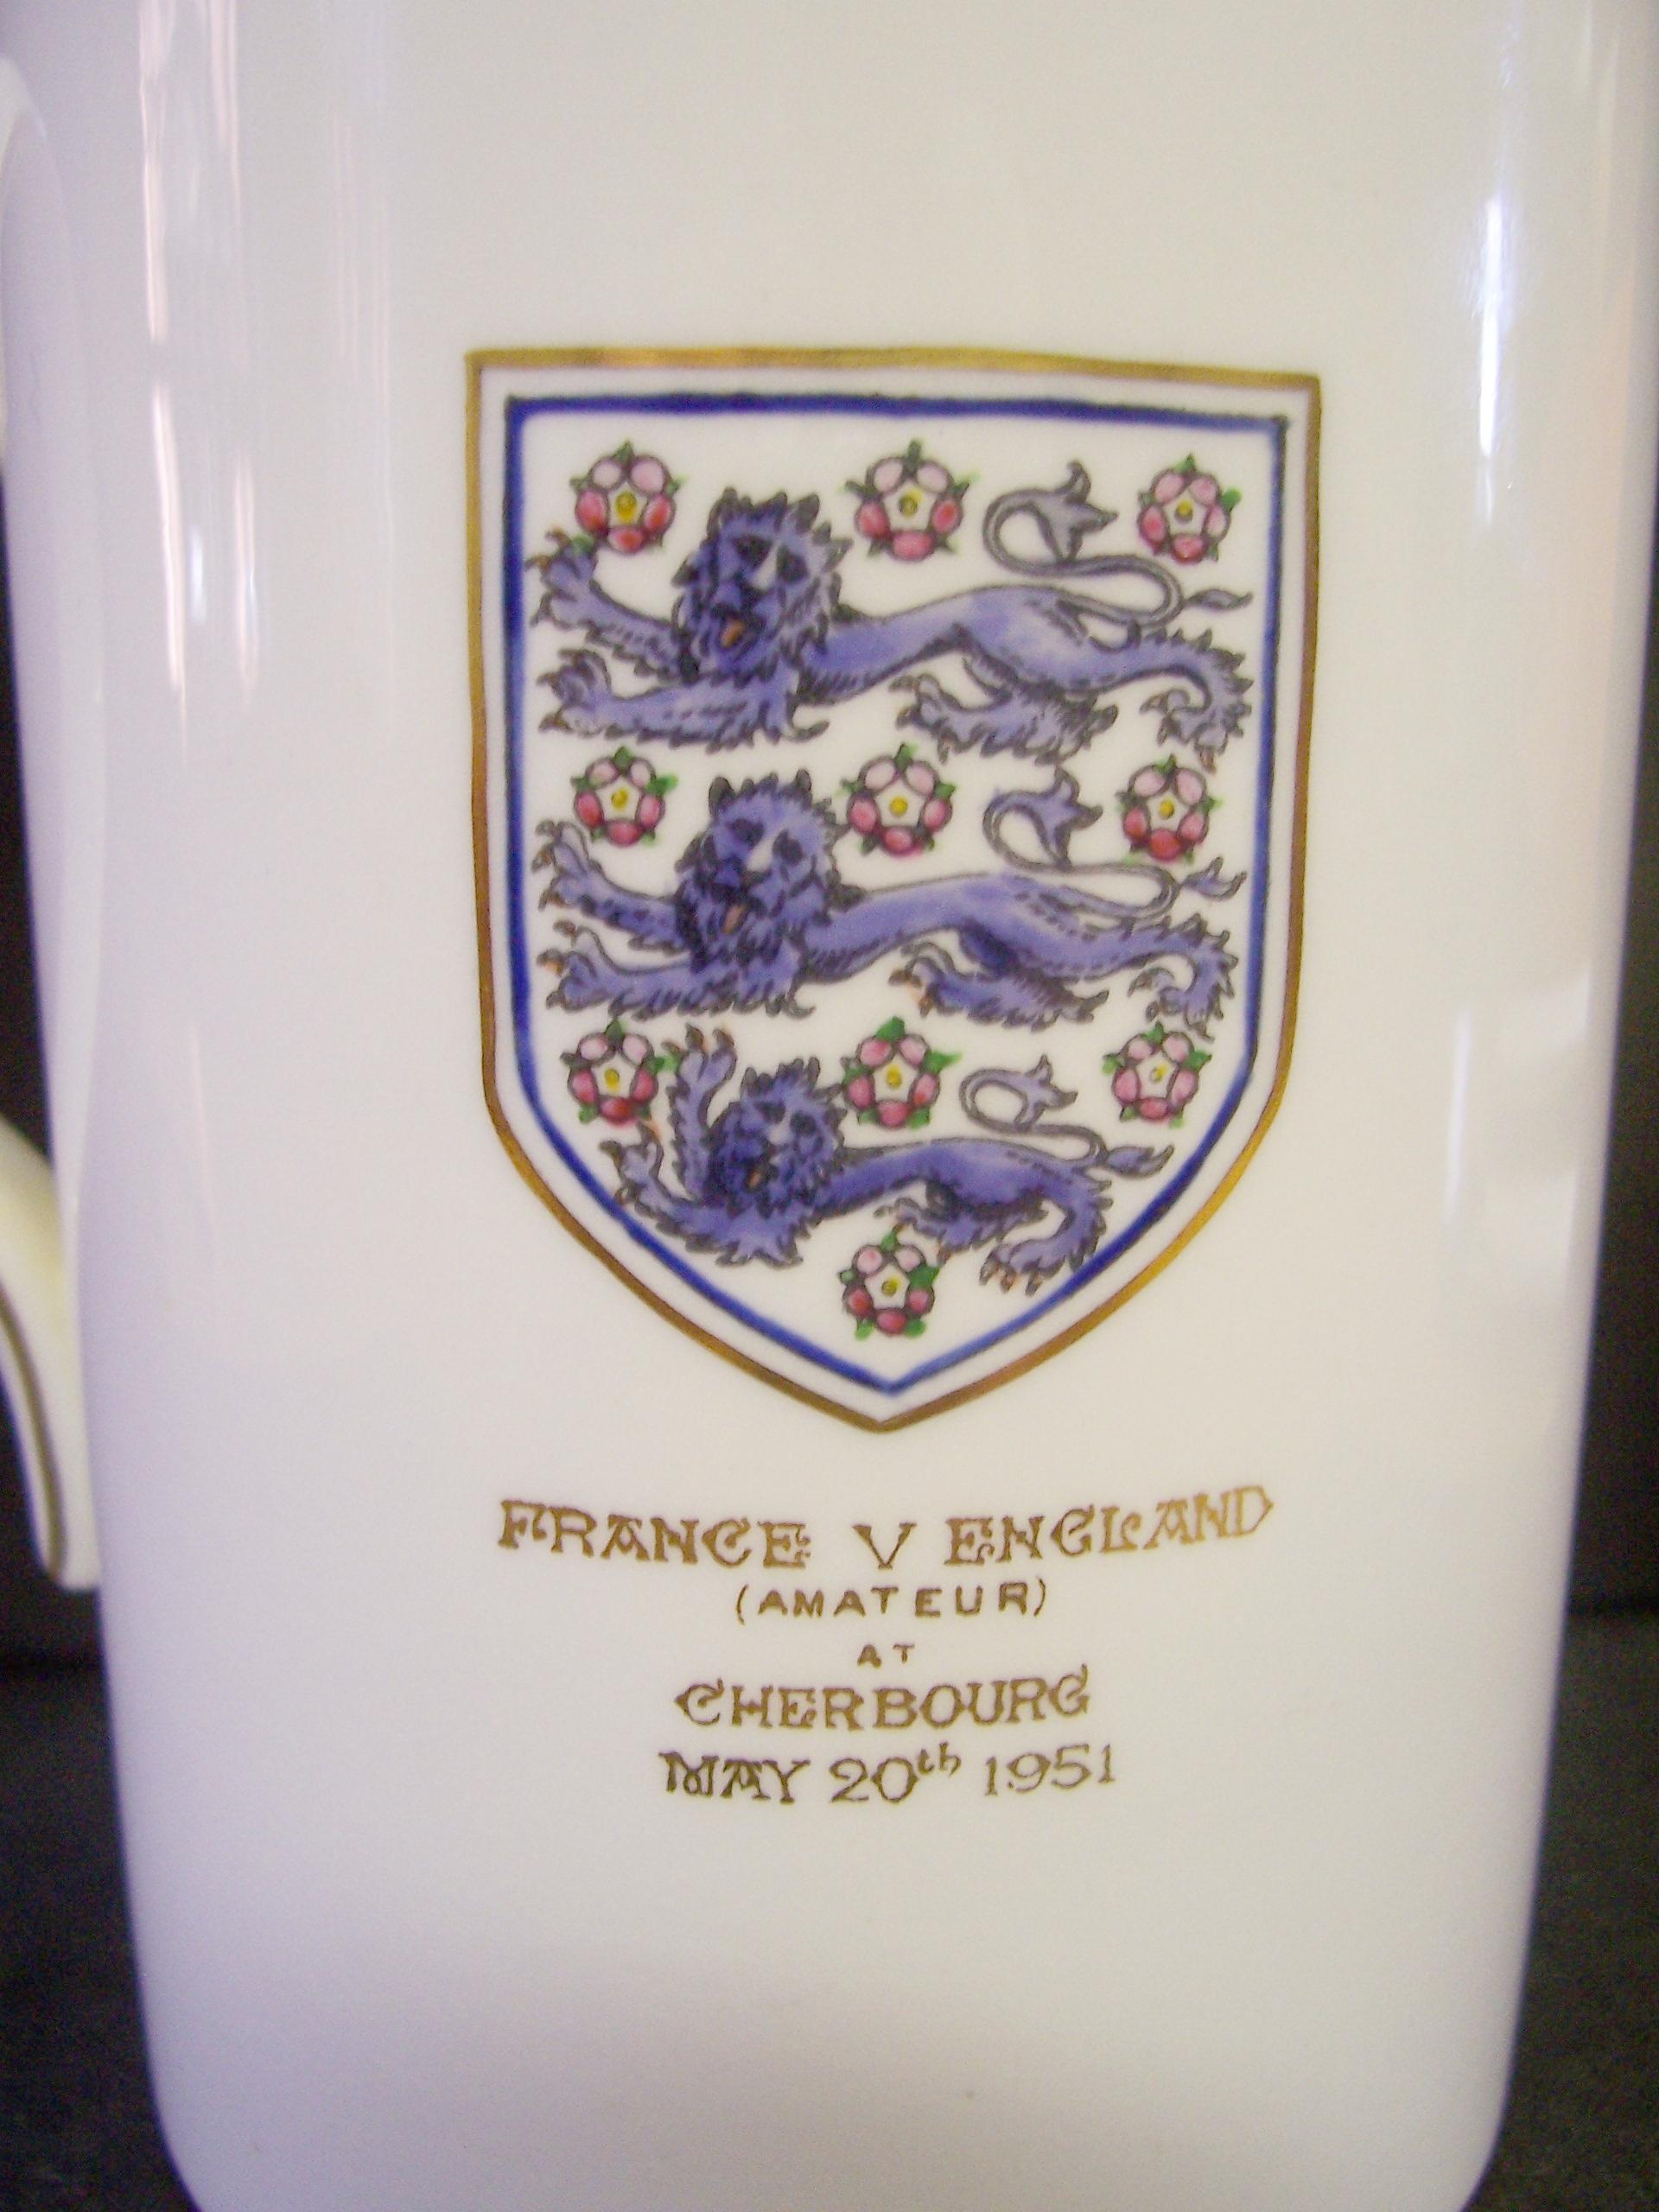 royal-crown-derby-1928-shape-tankard-france-v-england-cherbourg-1951-inscription